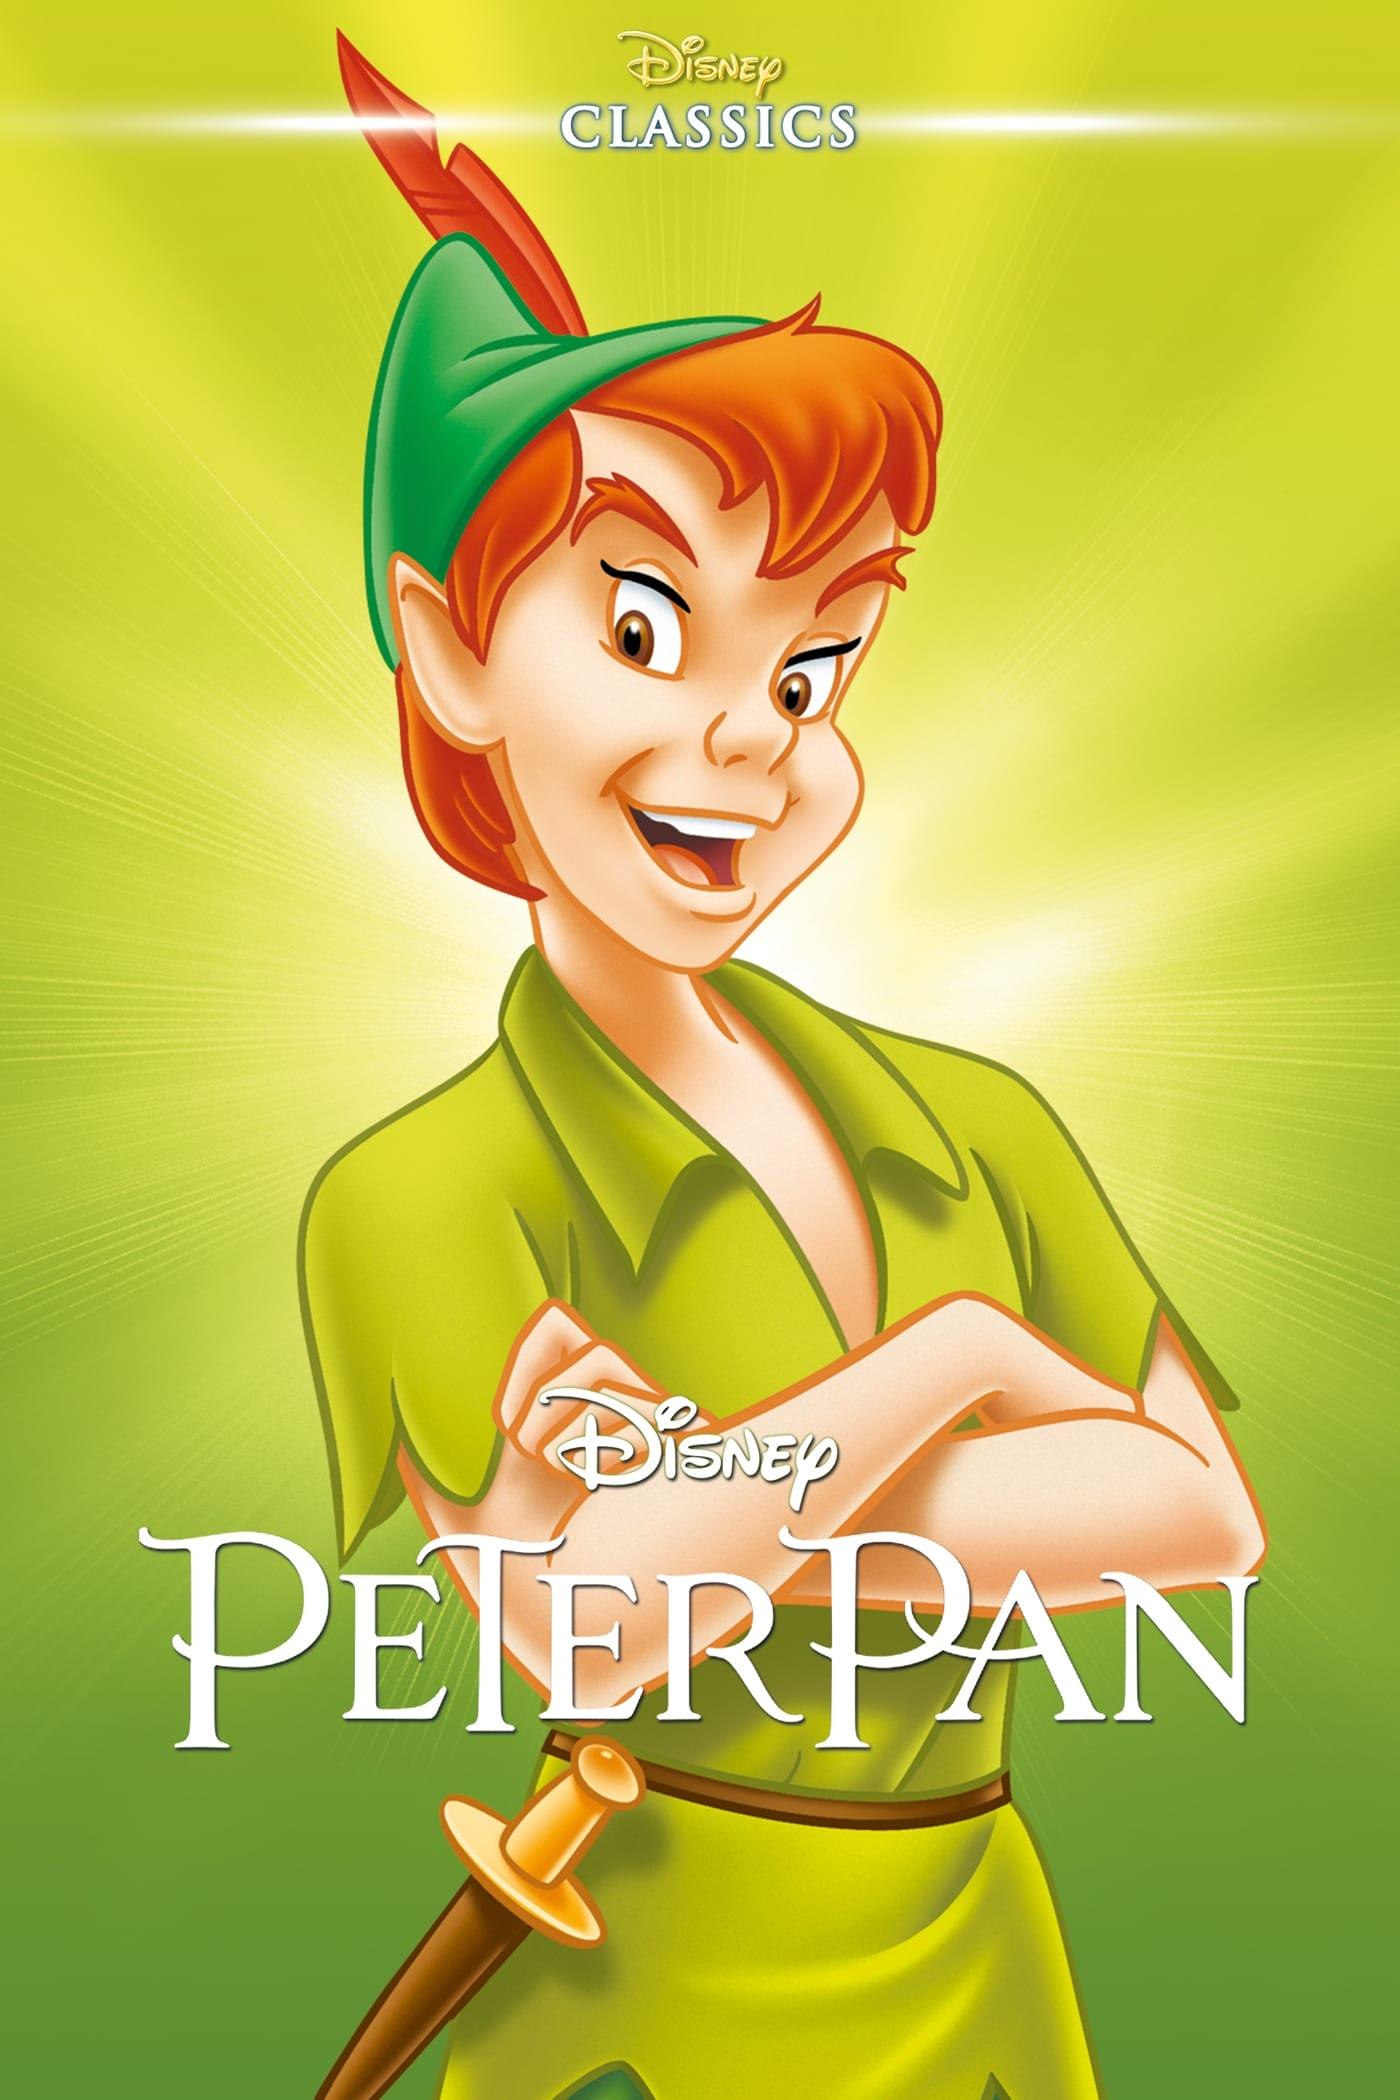 Peter pan 1953 posters the movie database tmdb - Image peter pan ...